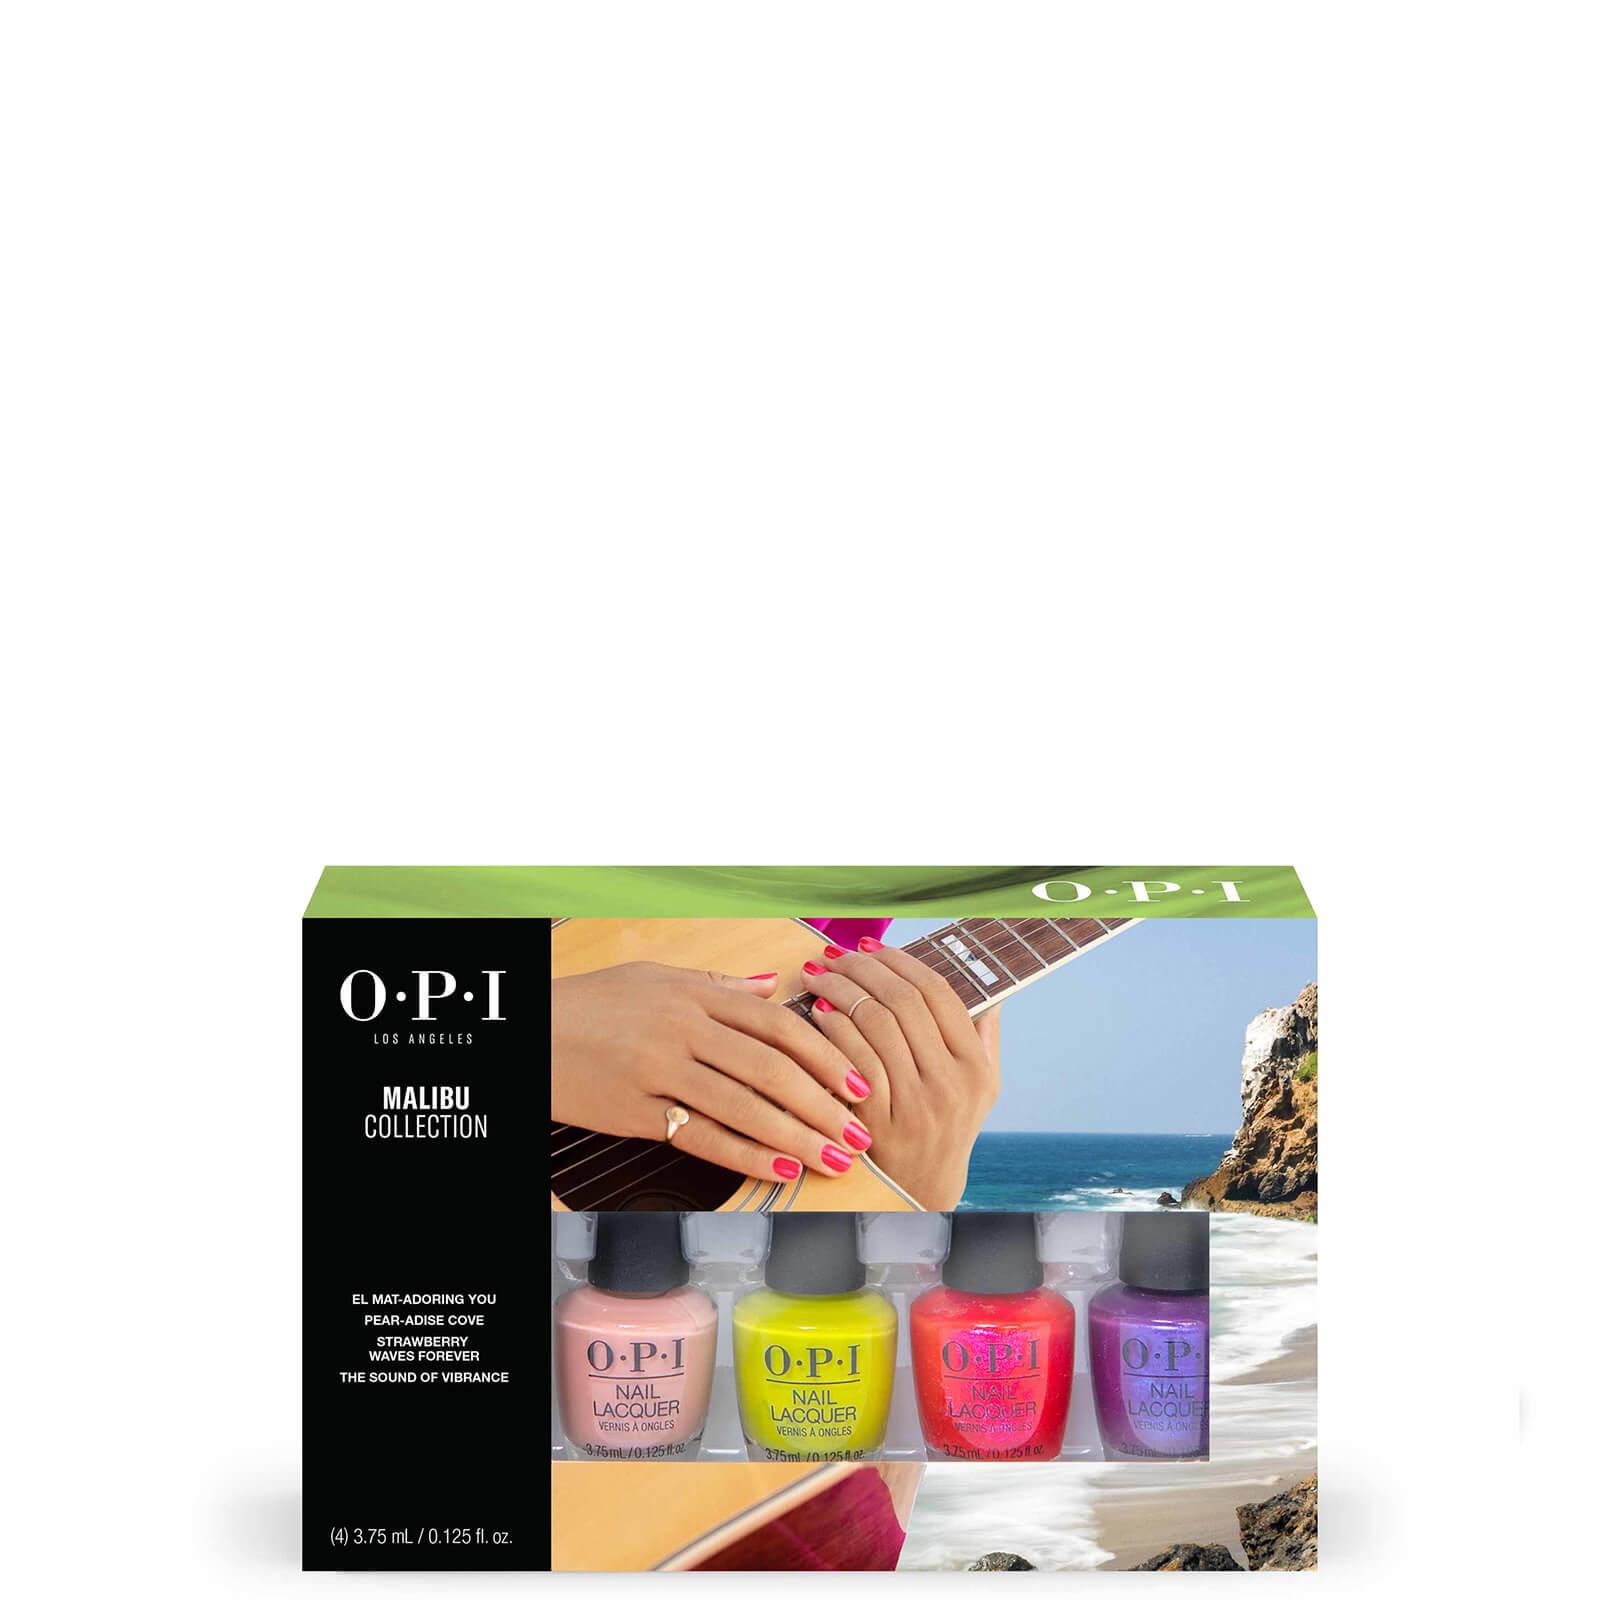 Купить OPI Nail Polish Malibu Collection Gift Set